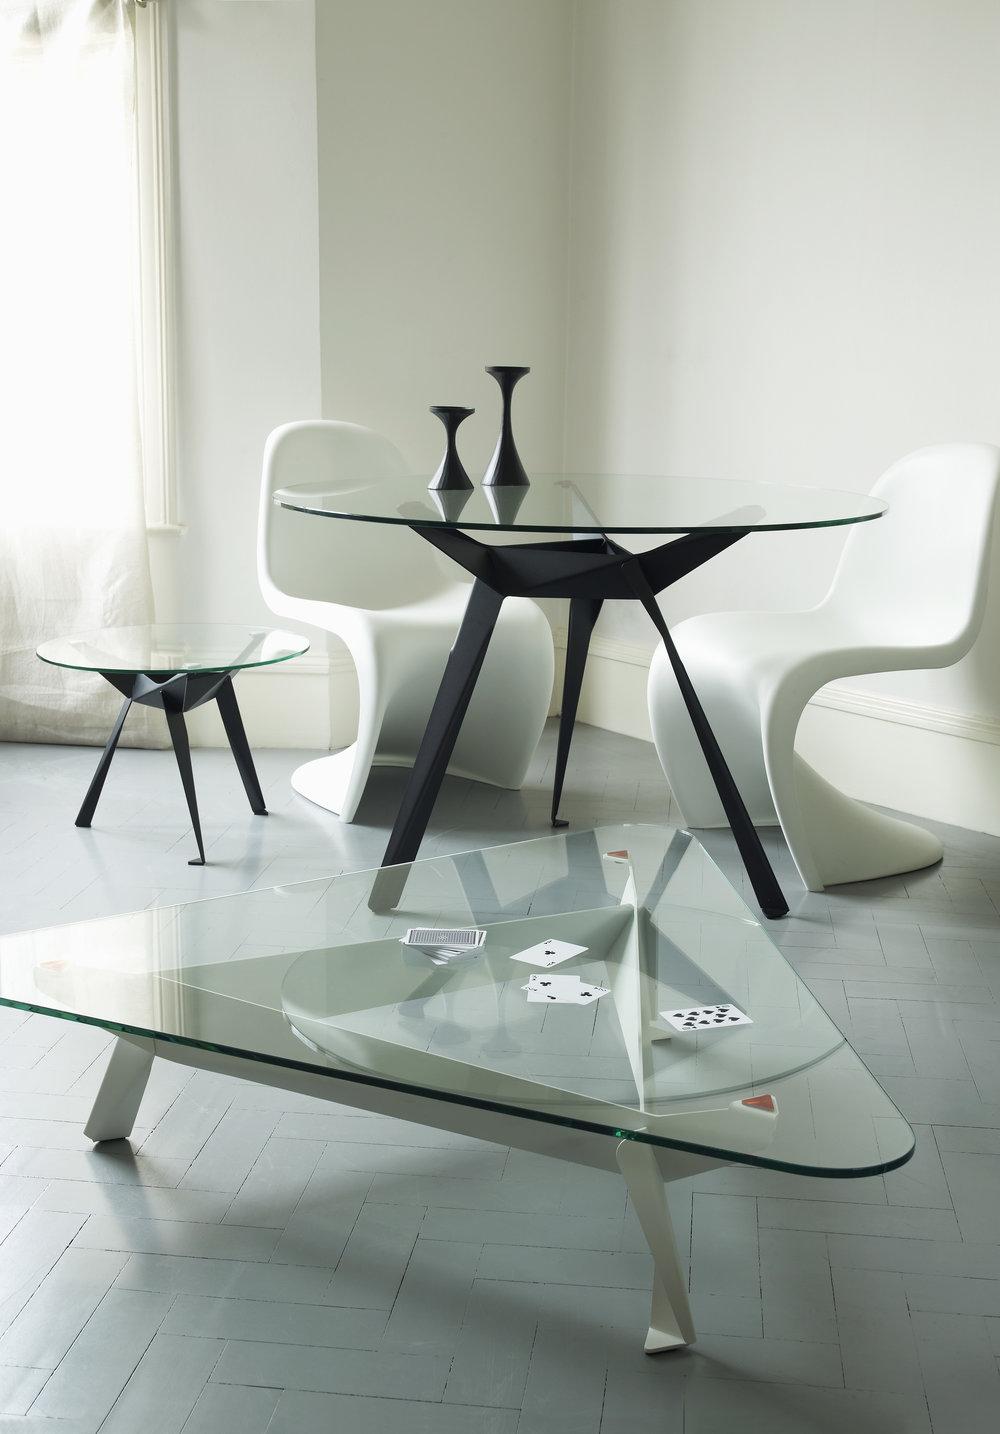 Origami Table Range.jpg